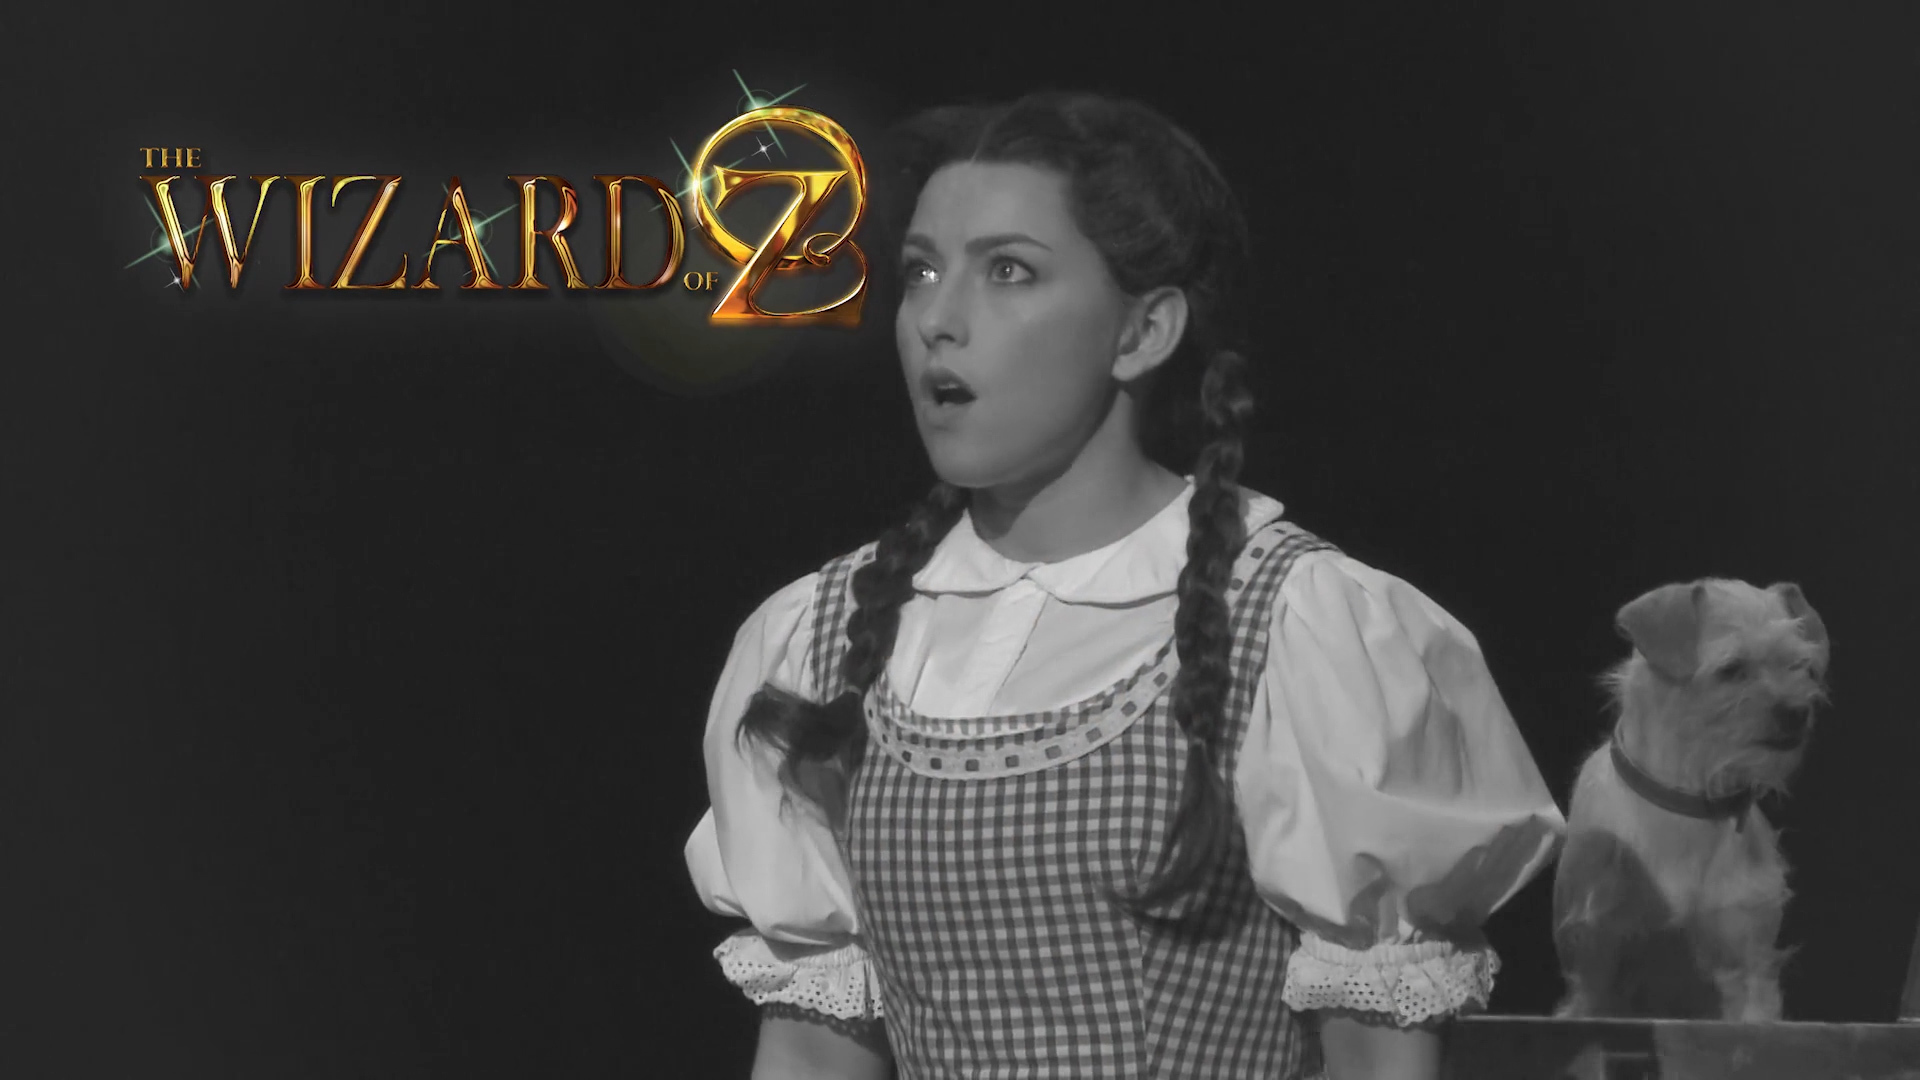 Wizard of Oz promo